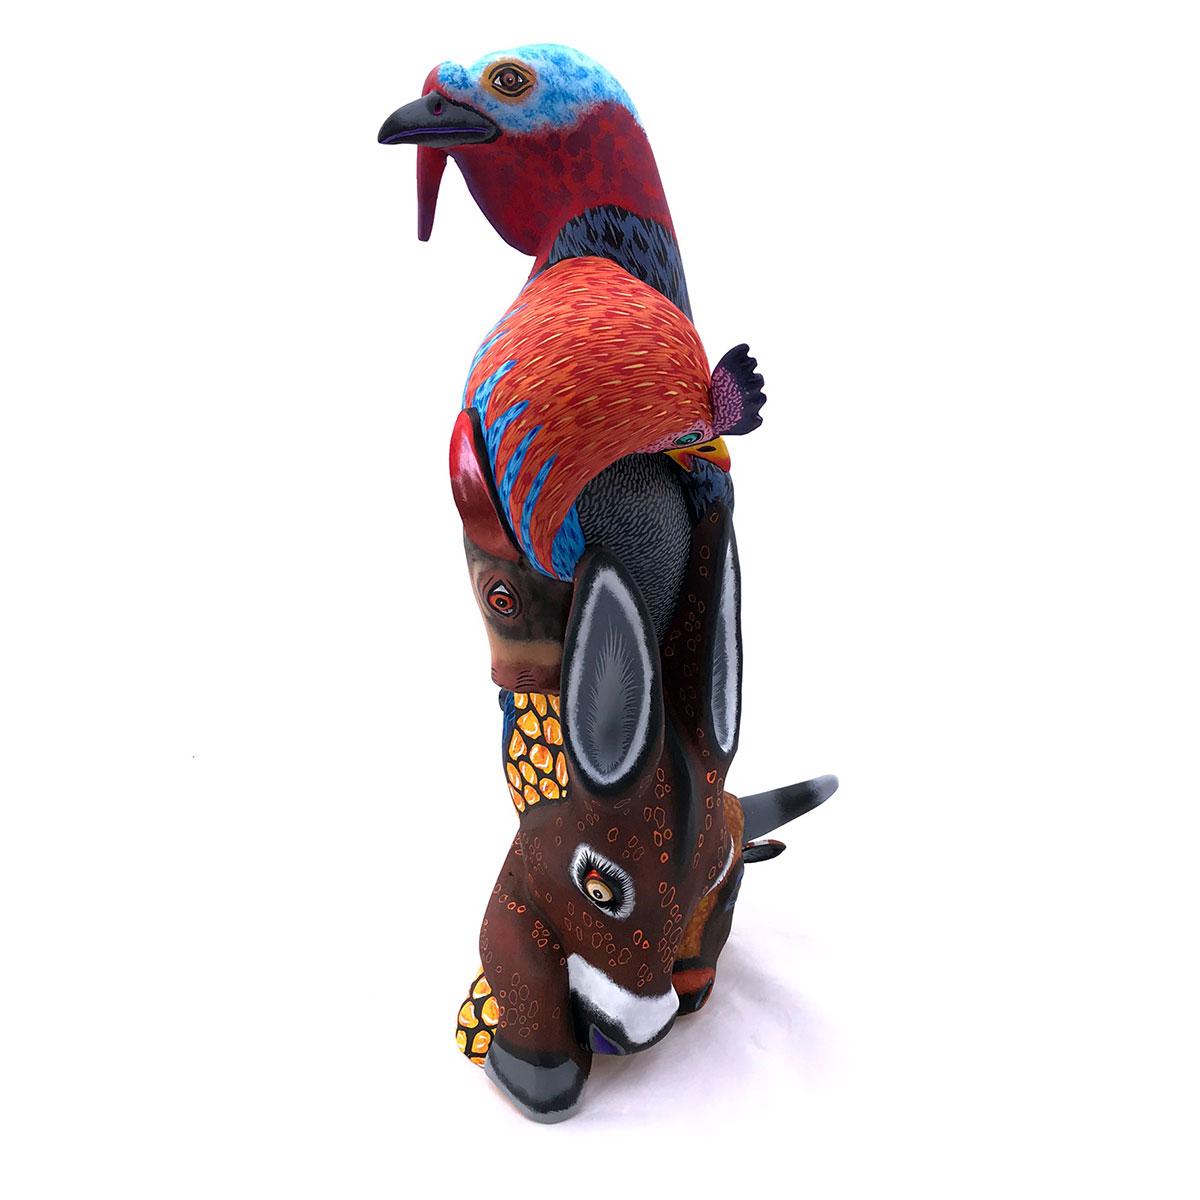 Eleazar Morales Eleazar Morales: Stunning Large Farm Animal Totem carving explorations